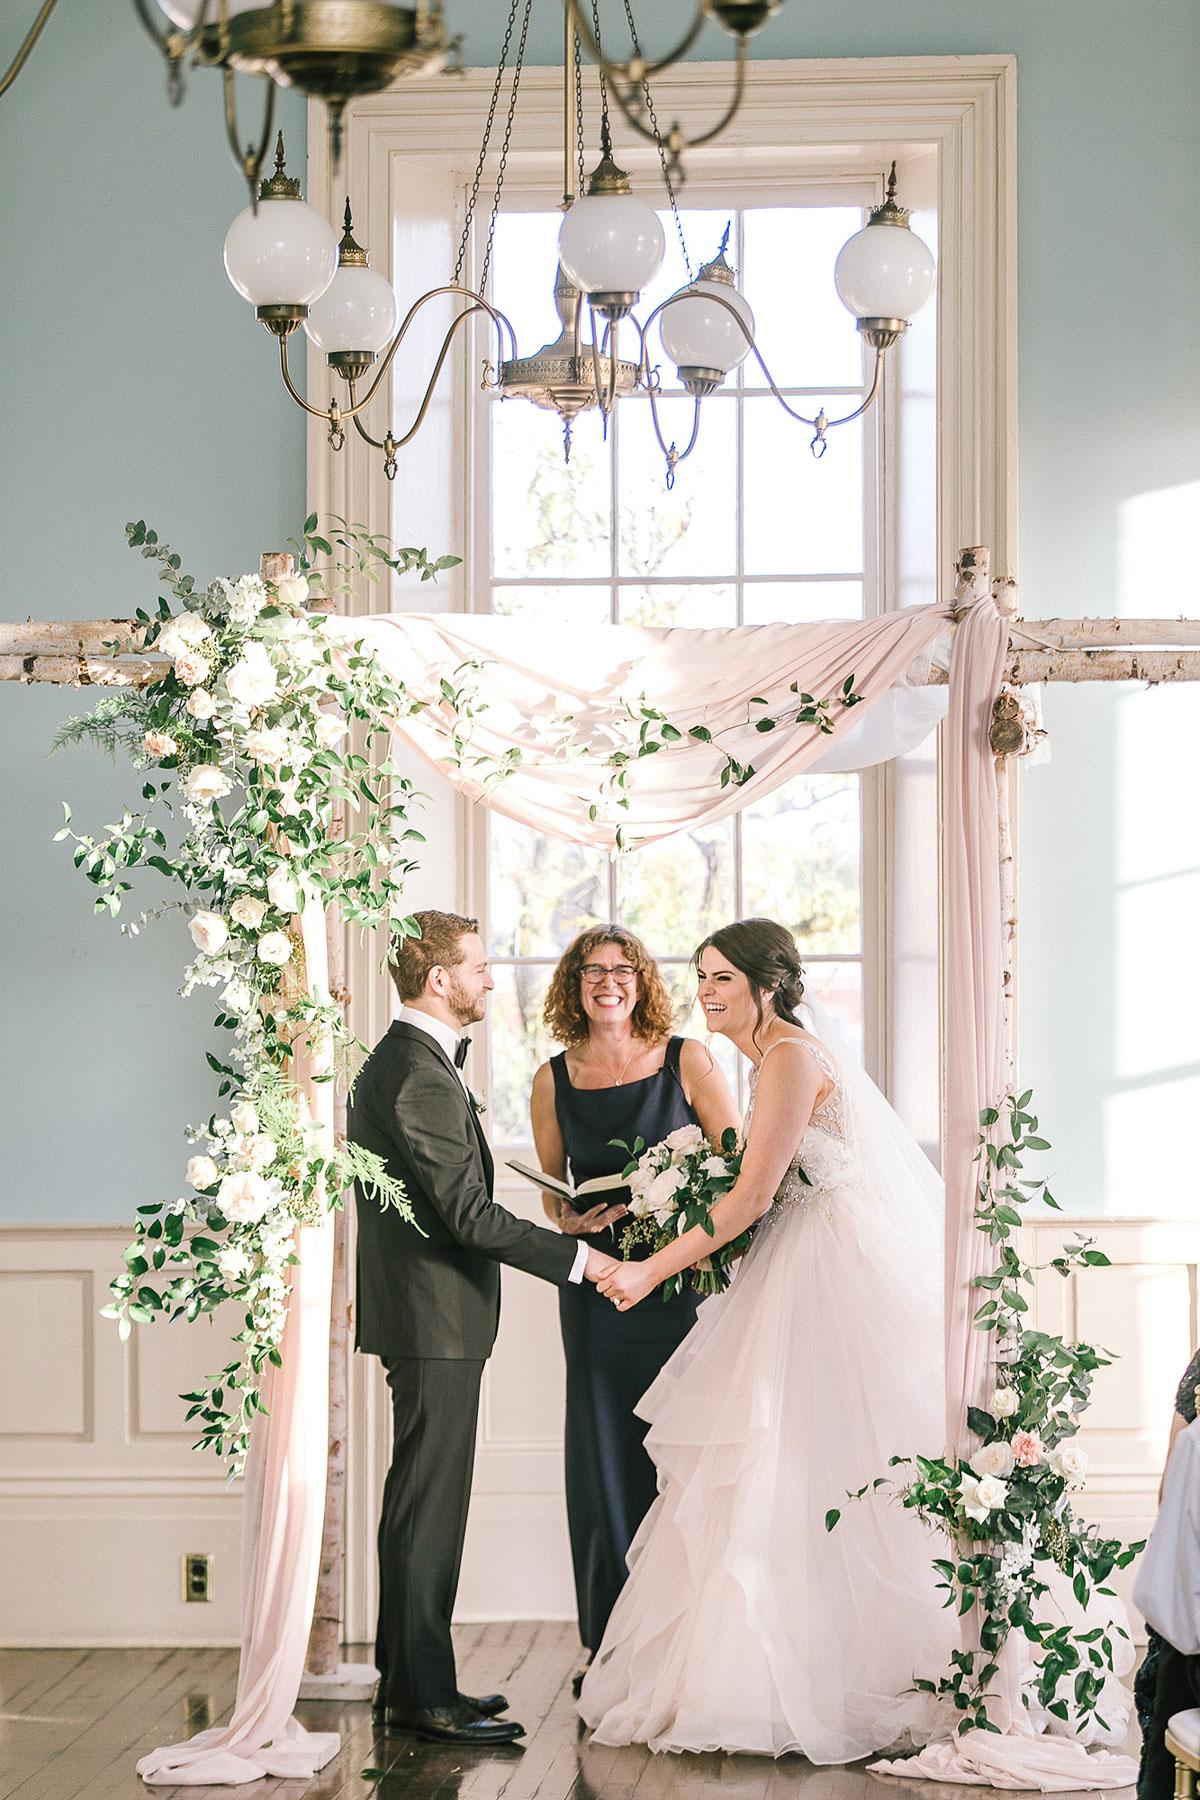 tamara-lockwood-photography-vineyard-bride-swish-list-the-old-courthouse-niagara-on-the-lake-wedding-54.jpg